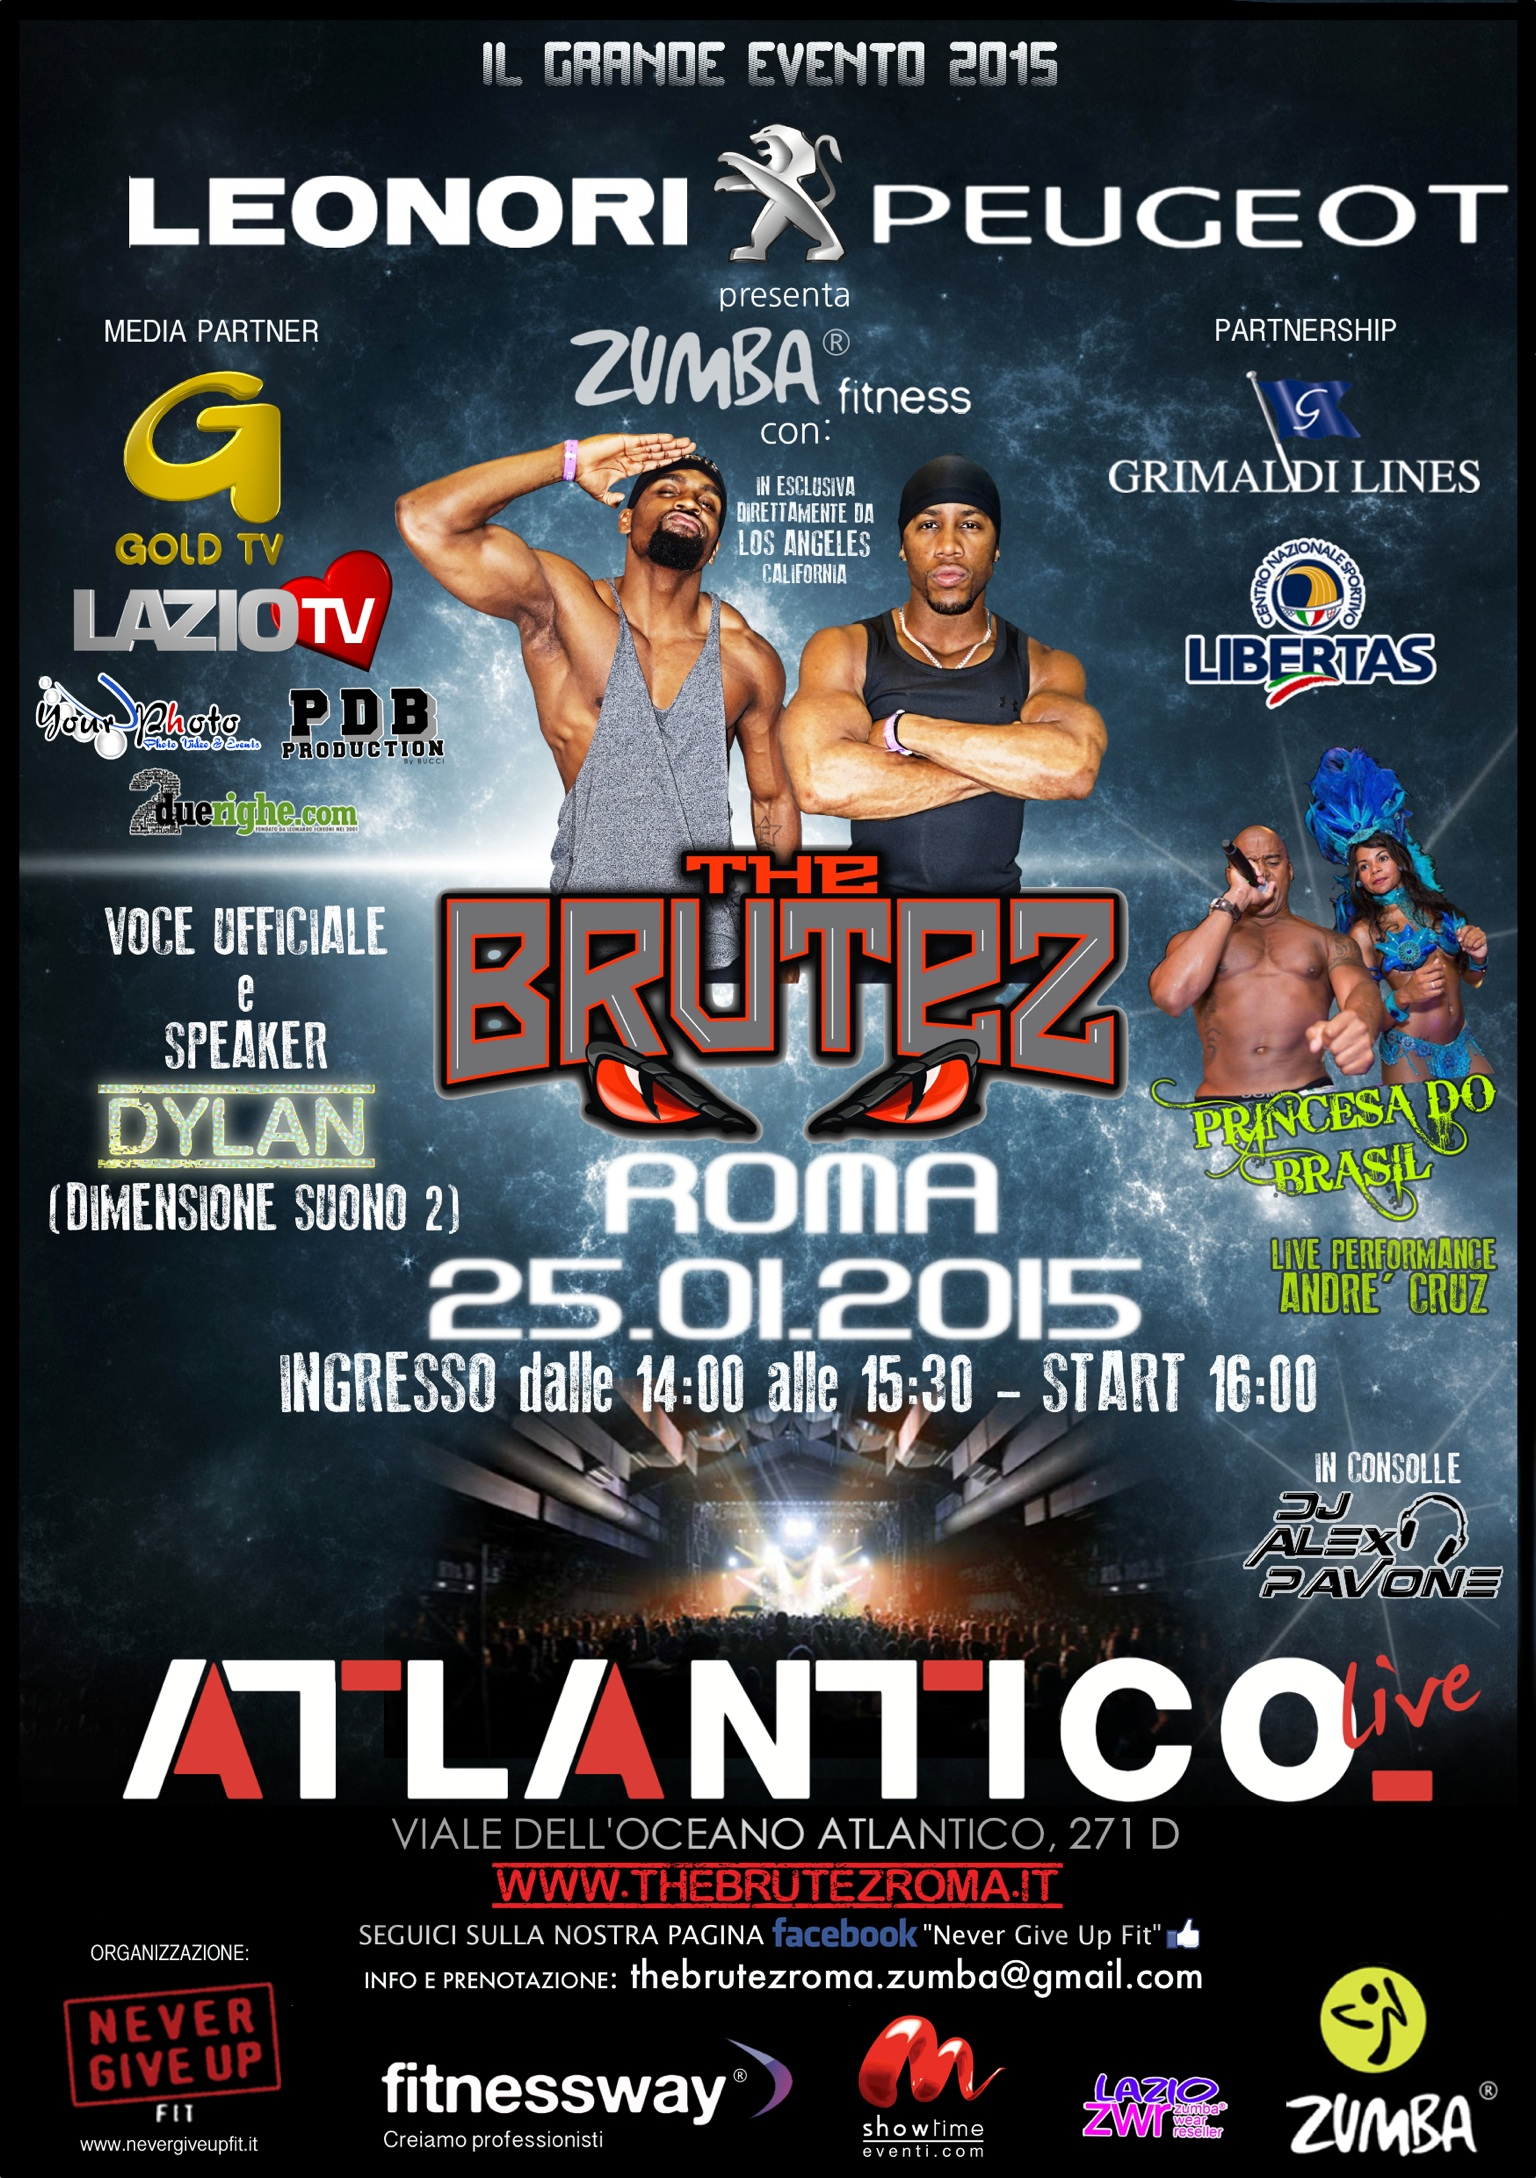 Zumba Fitness: THE BRUTEZ – 25 Gennaio 2015 Roma, Atlantico Live